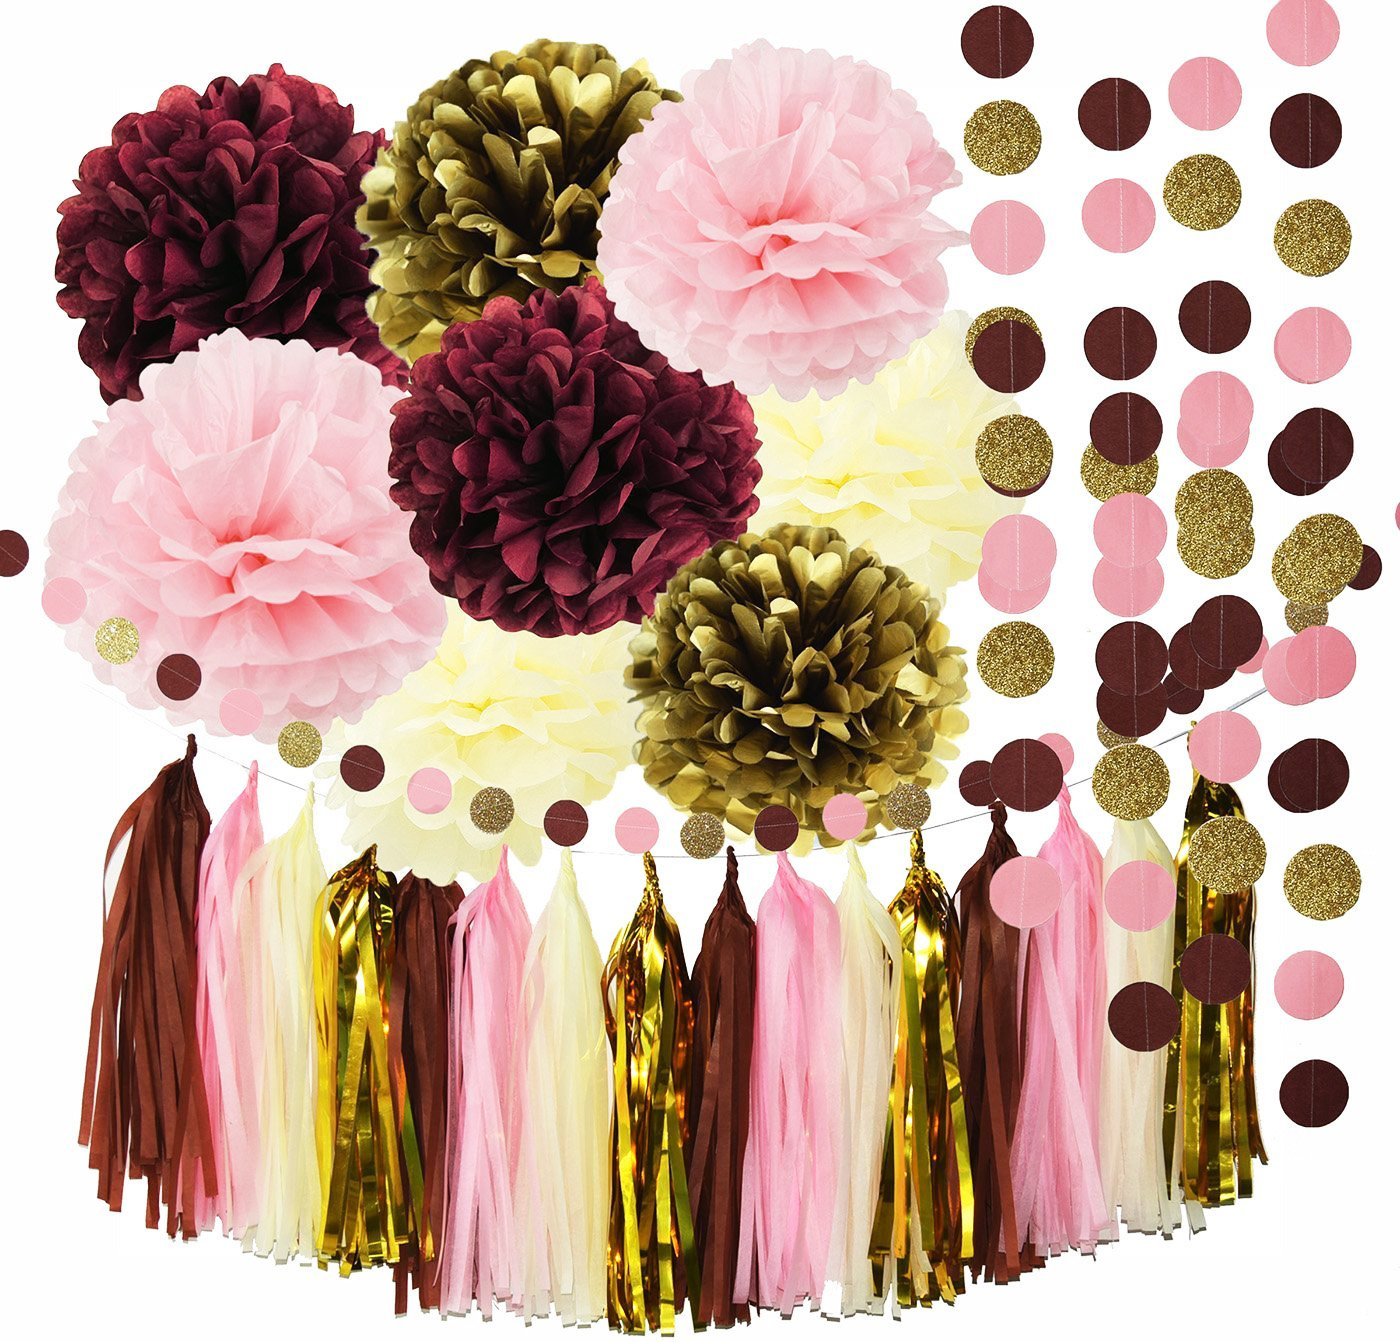 Qian's Party Bridal Shower Decorations Burgundy Pink Glitter Gold Birthday Decorations Tissue Paper Pom Pom Tassel Garland Wedding/Burgundy Party Decorations/Bachelorette Party Decorations